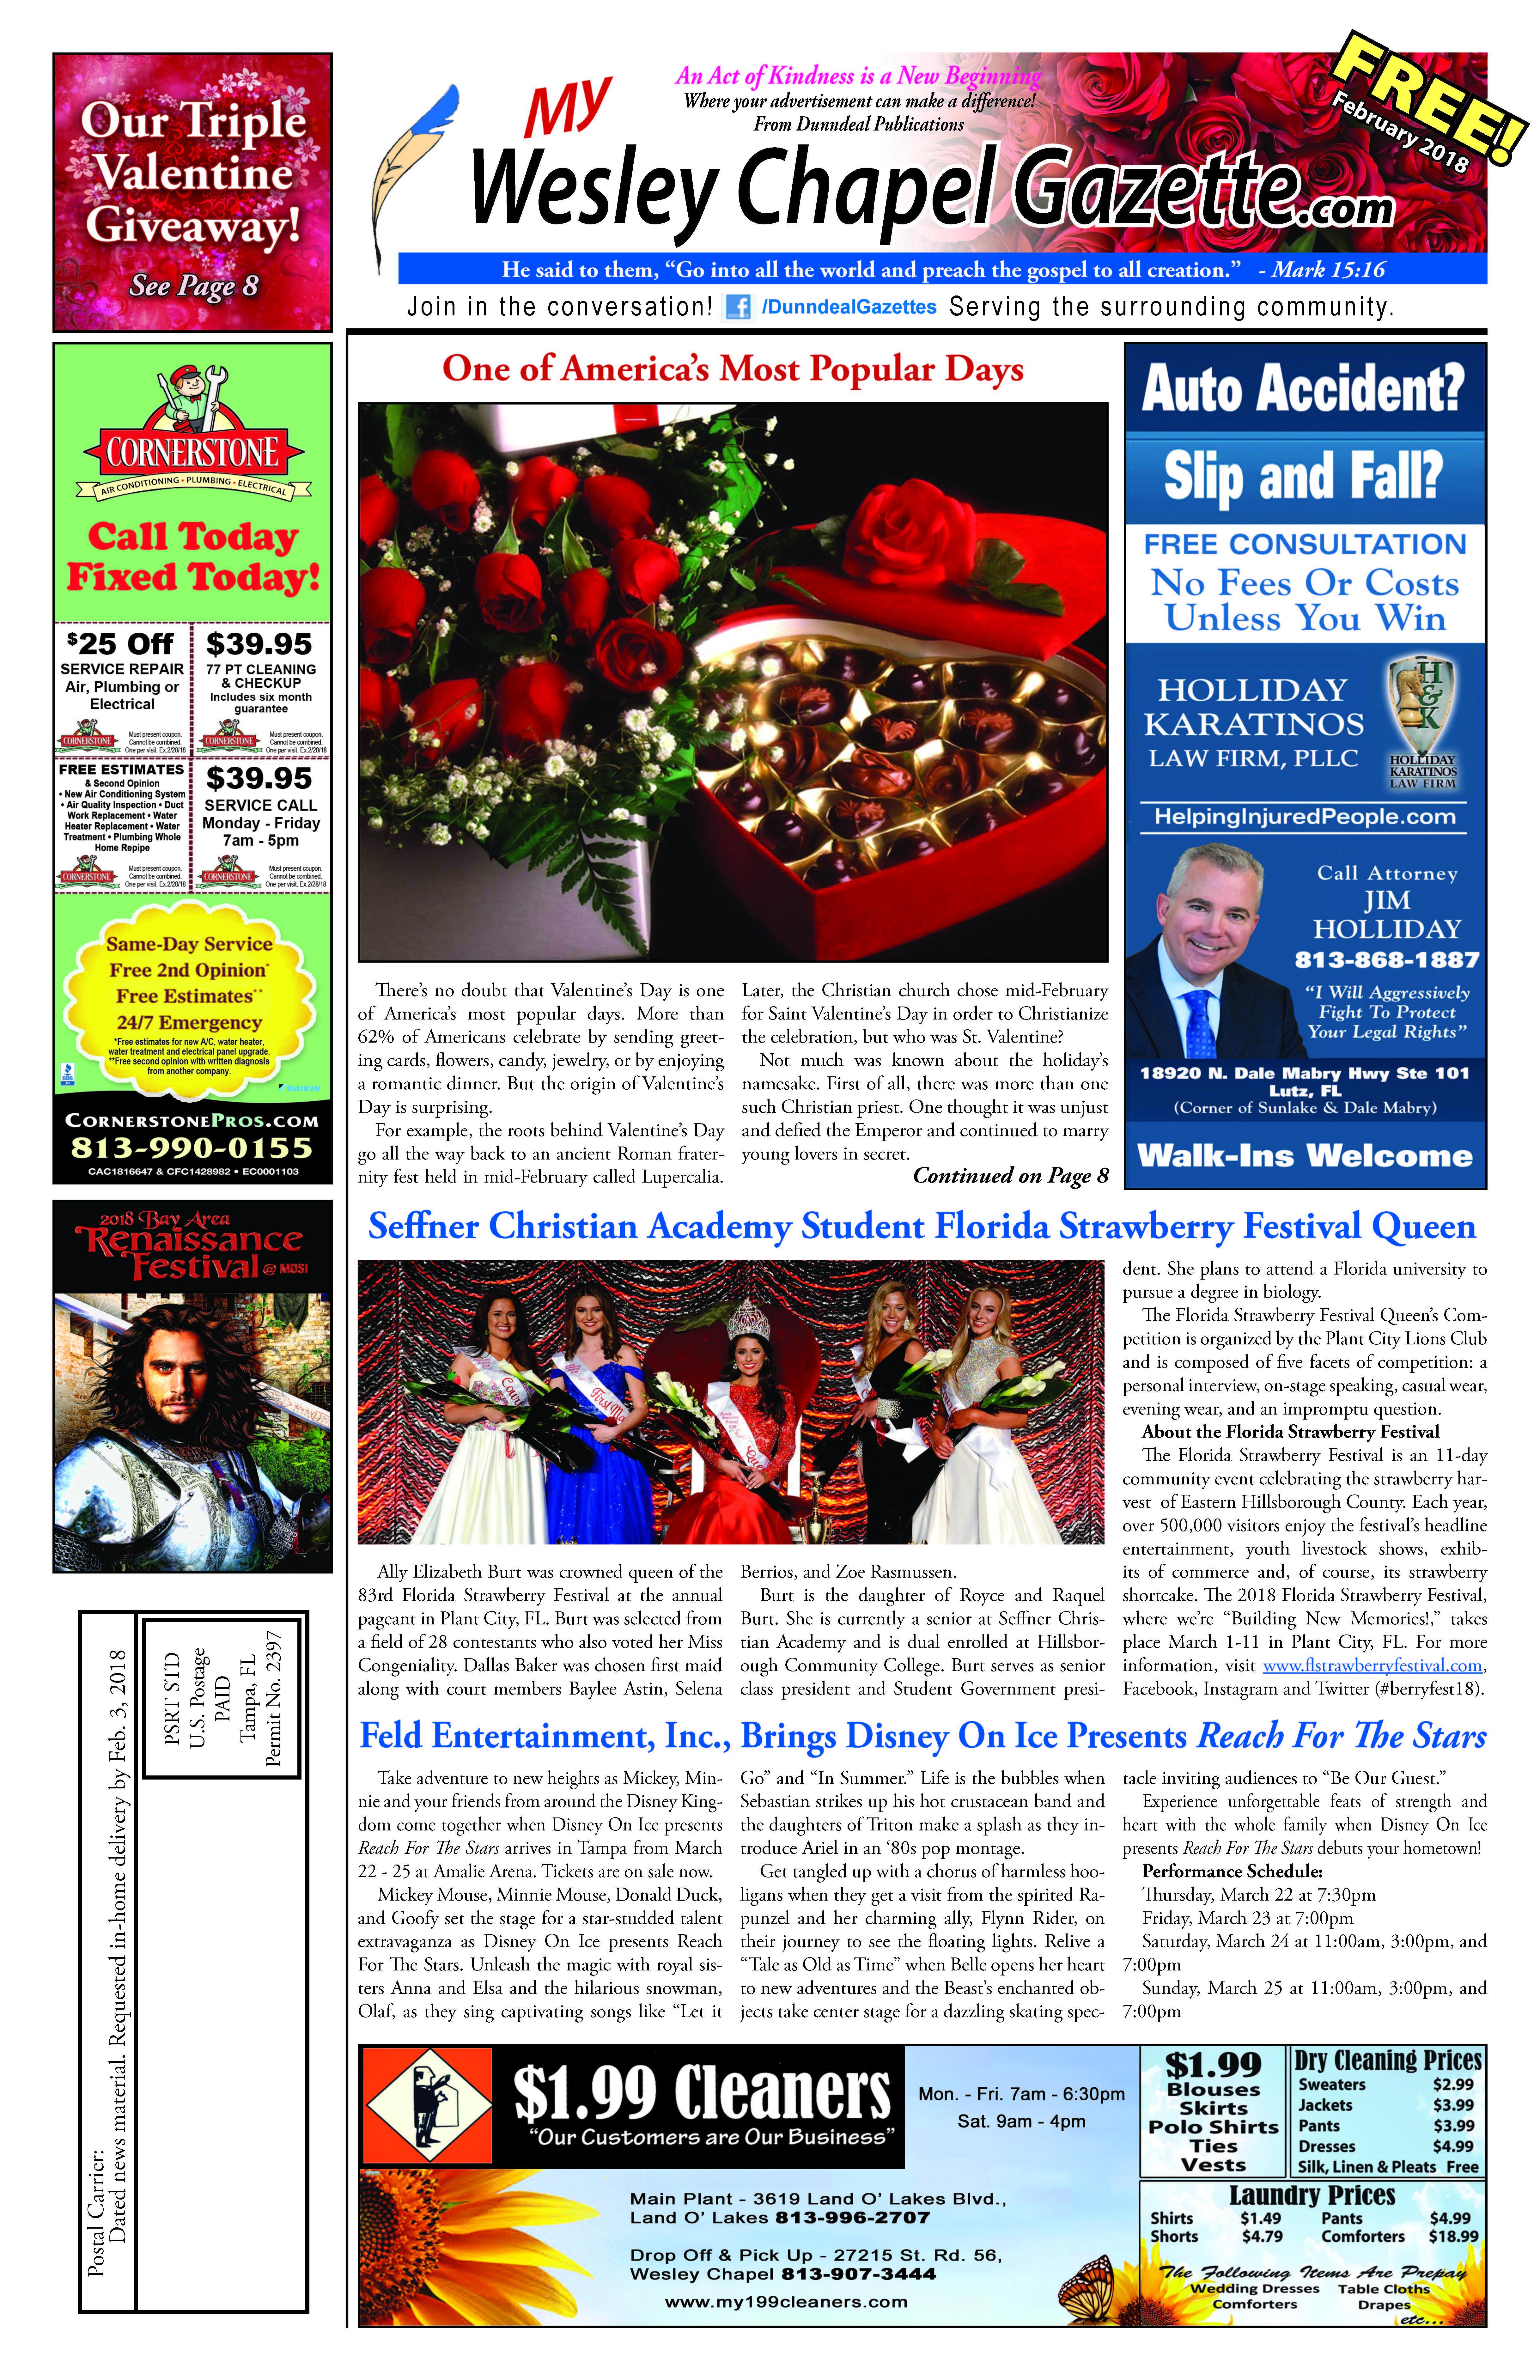 Wesley-Chapel-Gazette-February-2018_Page_01.jpg